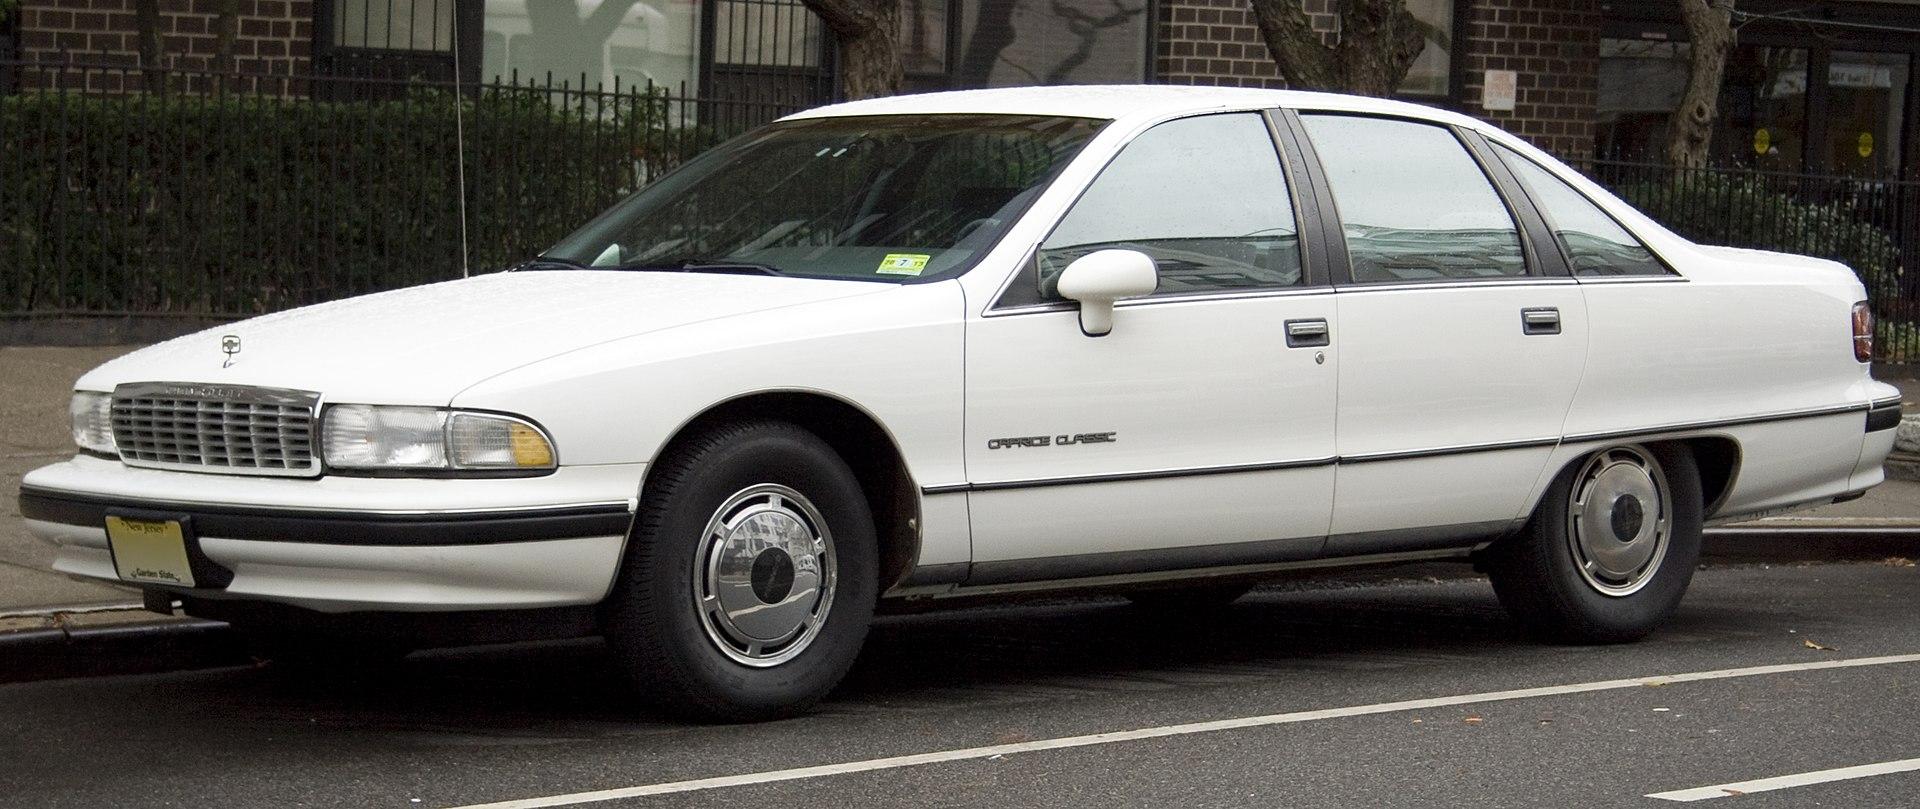 1920px-1991_Chevrolet_Caprice_Classic.jpg